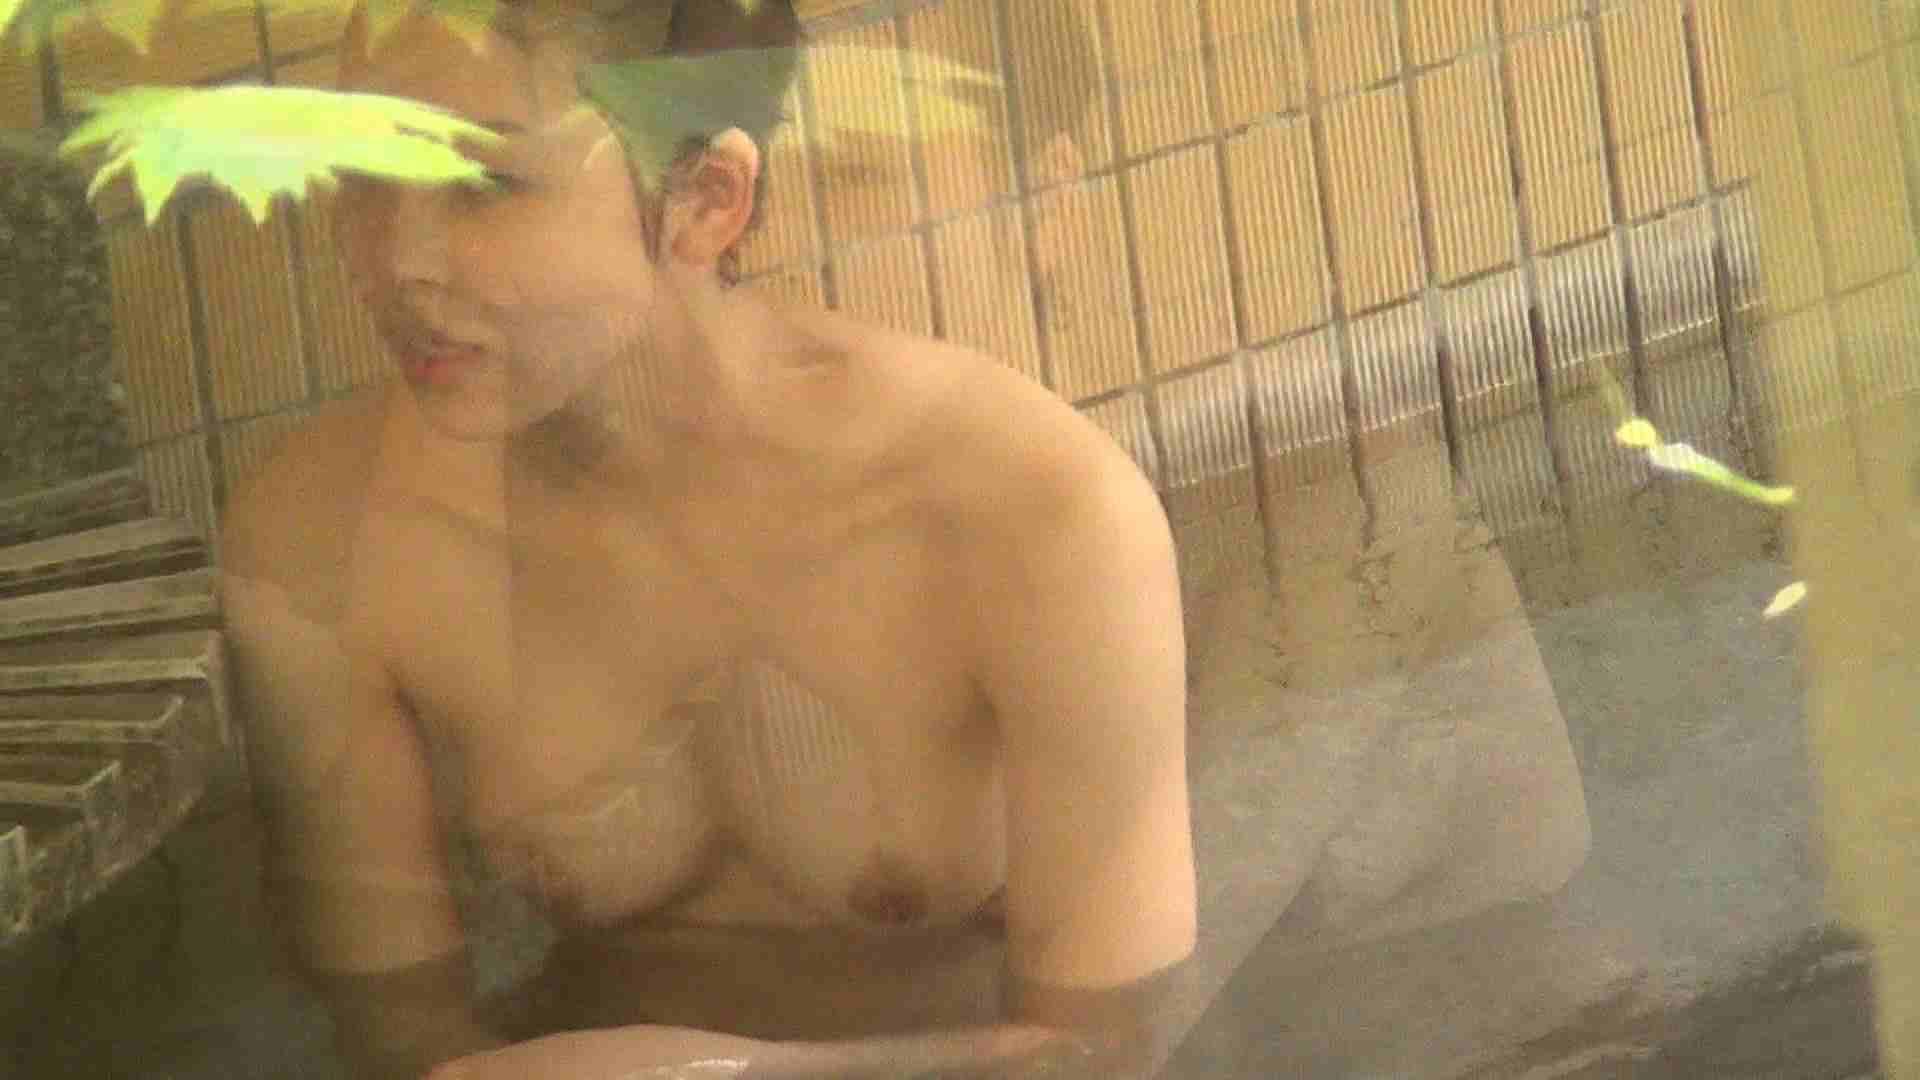 Aquaな露天風呂Vol.242 美しいOLの裸体 | 露天風呂突入  107pic 55